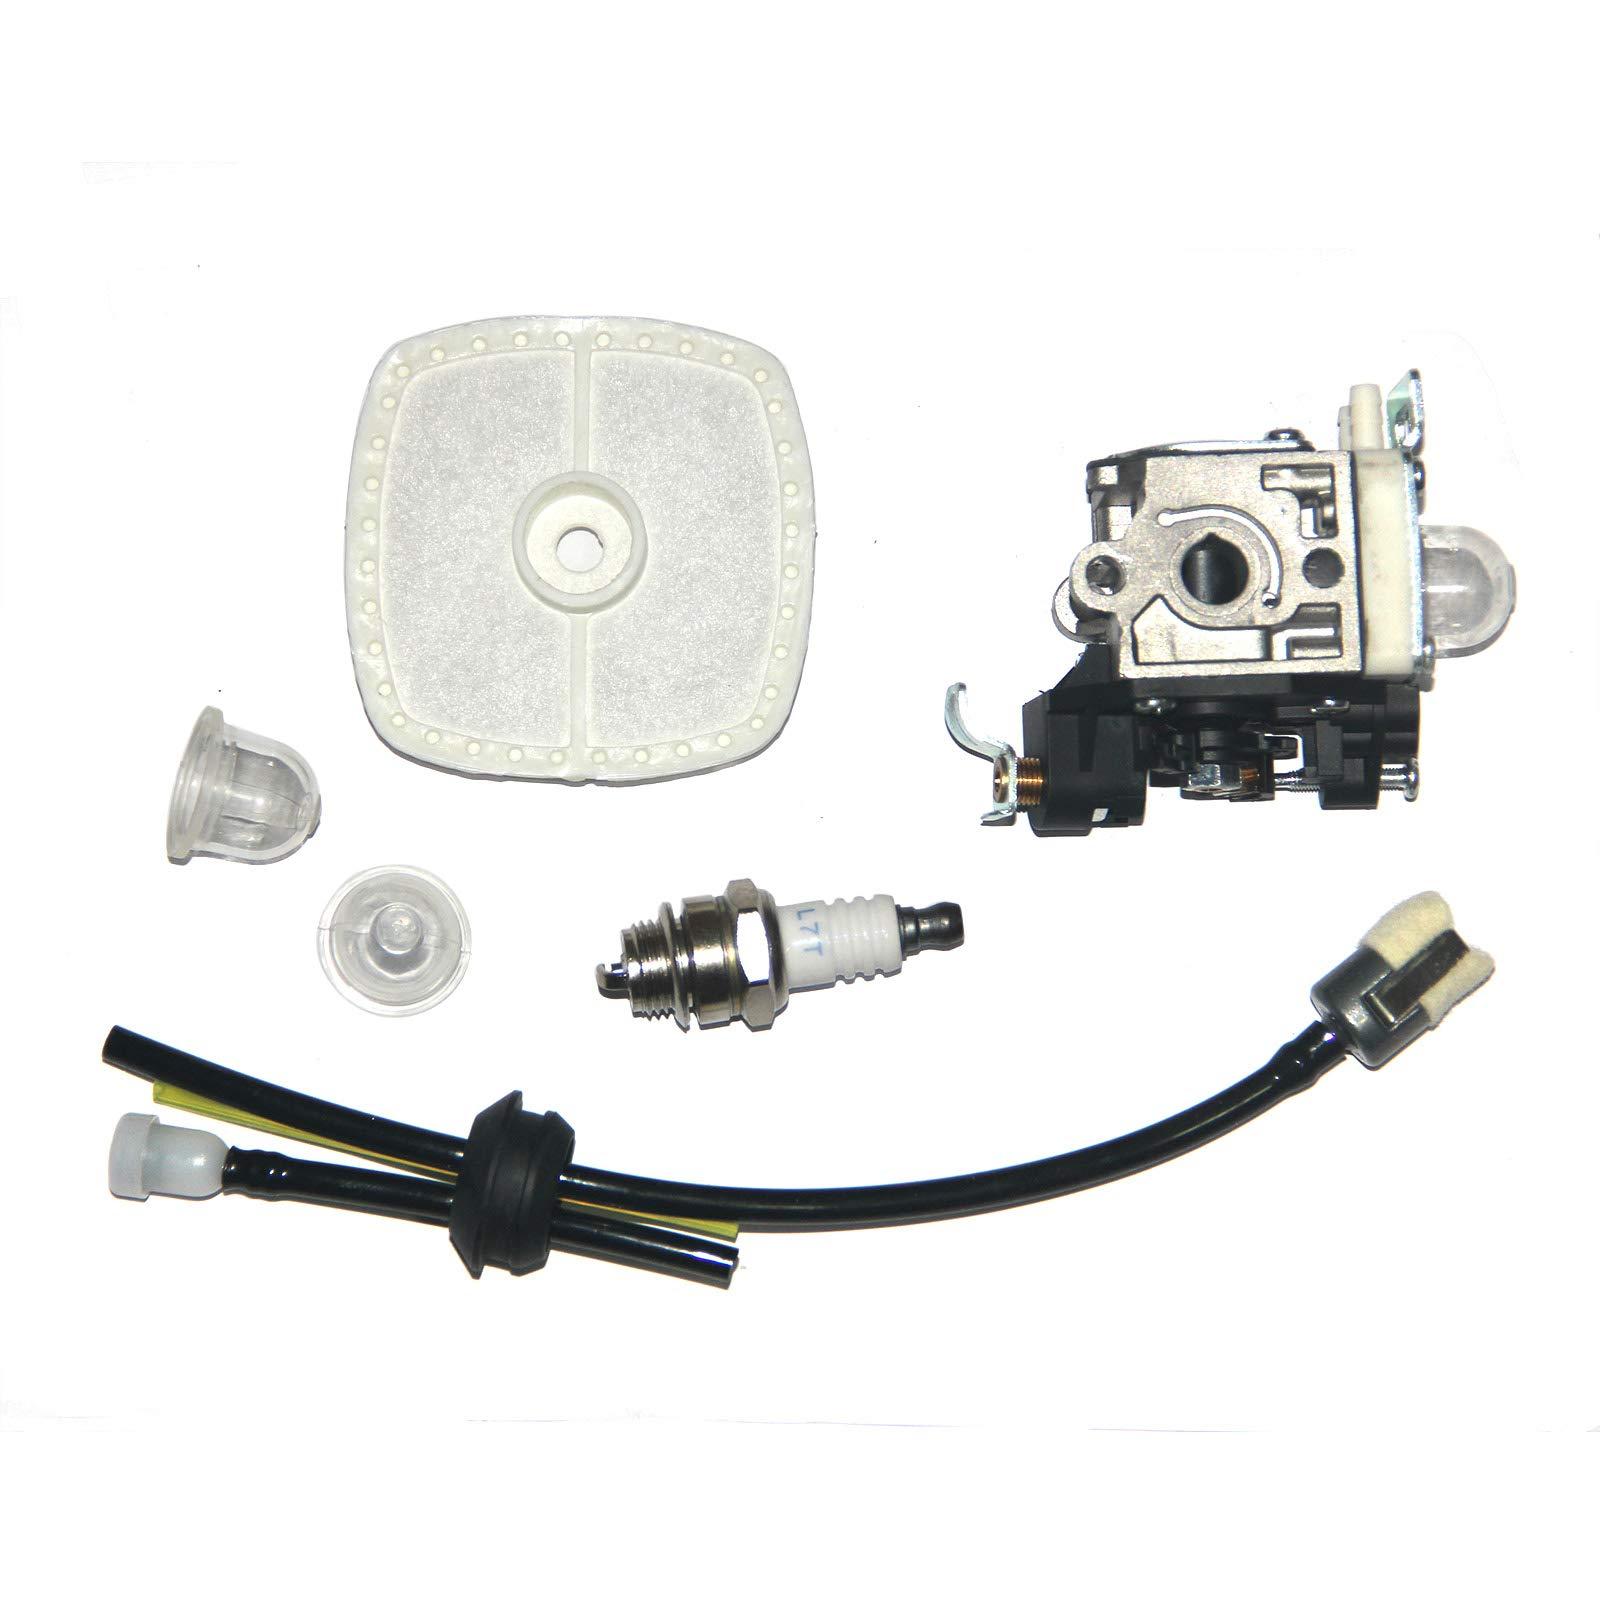 PB-265L Carburetor for Echo PB-251 RB-K85 Fuel Line kit with Spark Plug Primer Bulb PB-265LN Power Blowers Carb A021001350